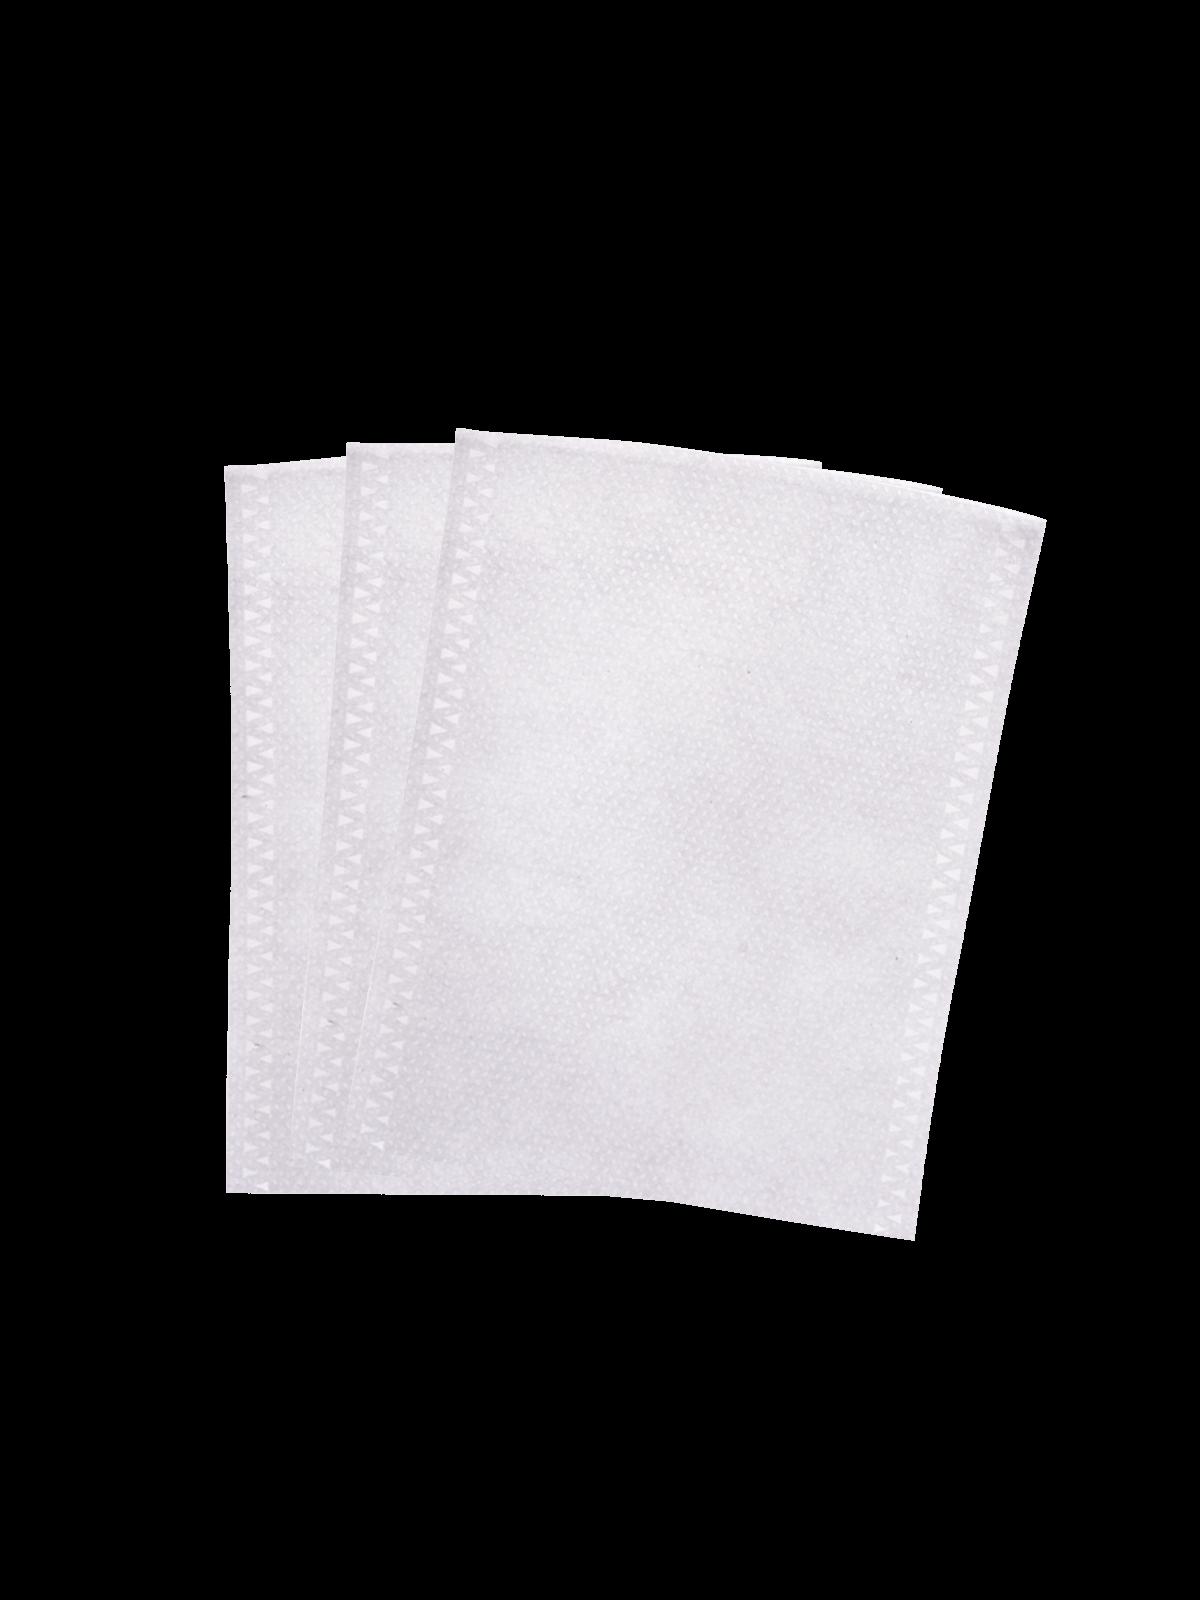 Mars Anti Gravity Mask sheets